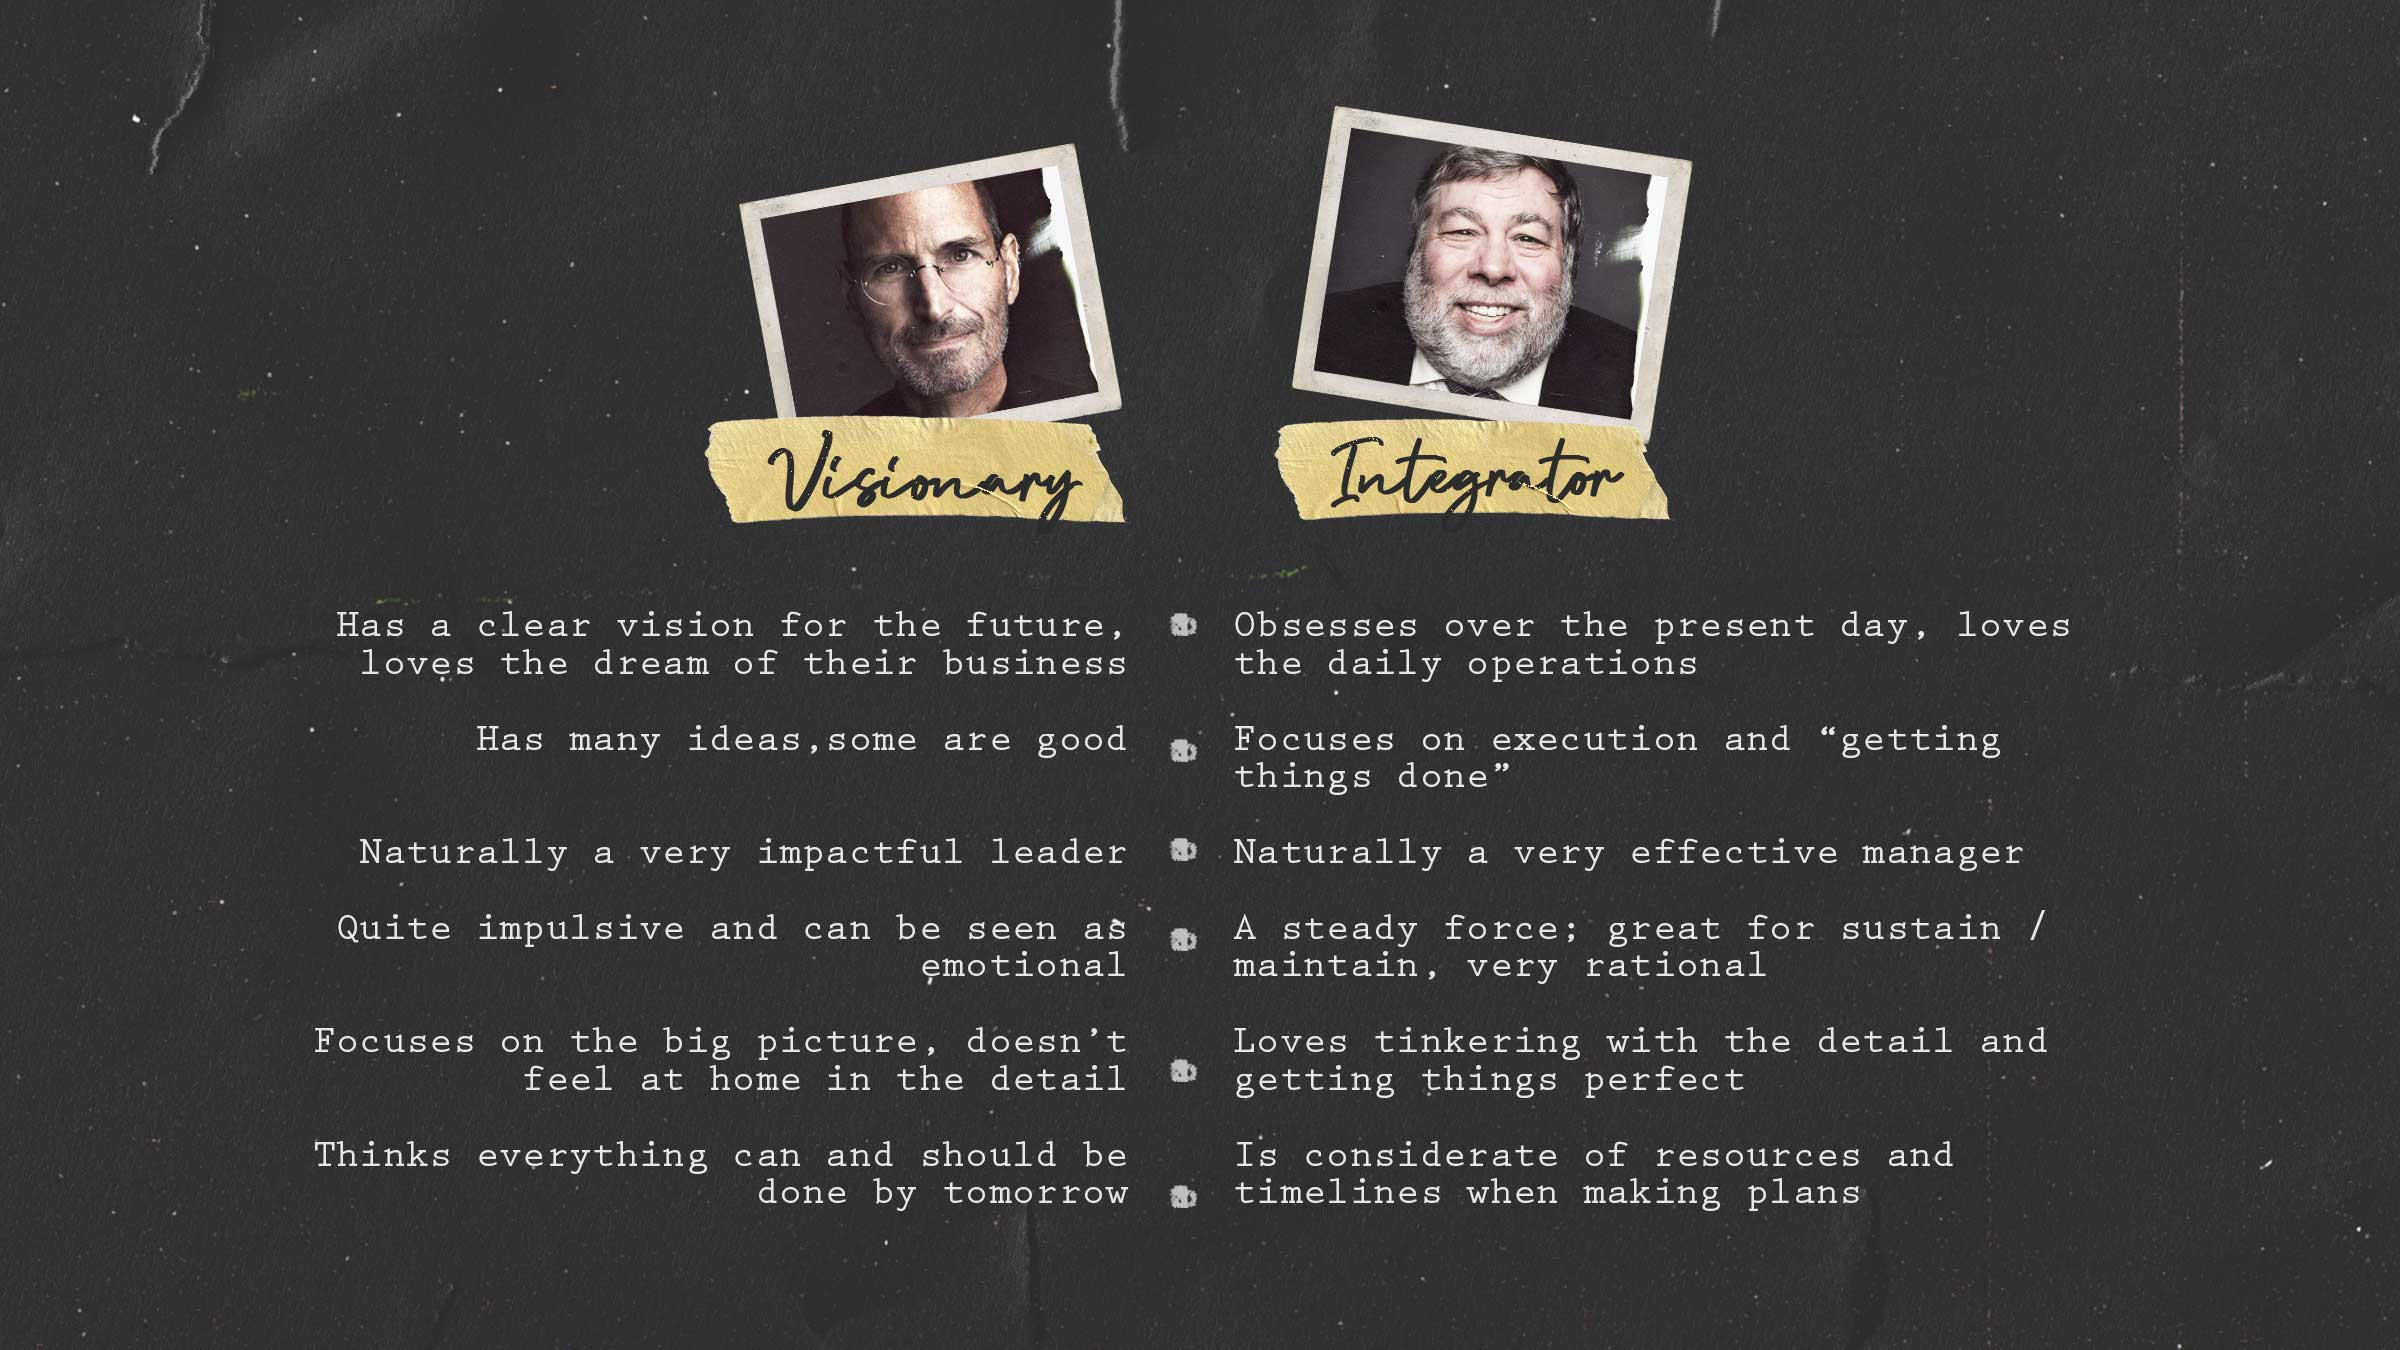 BLOG-Integrator-and-Visionary